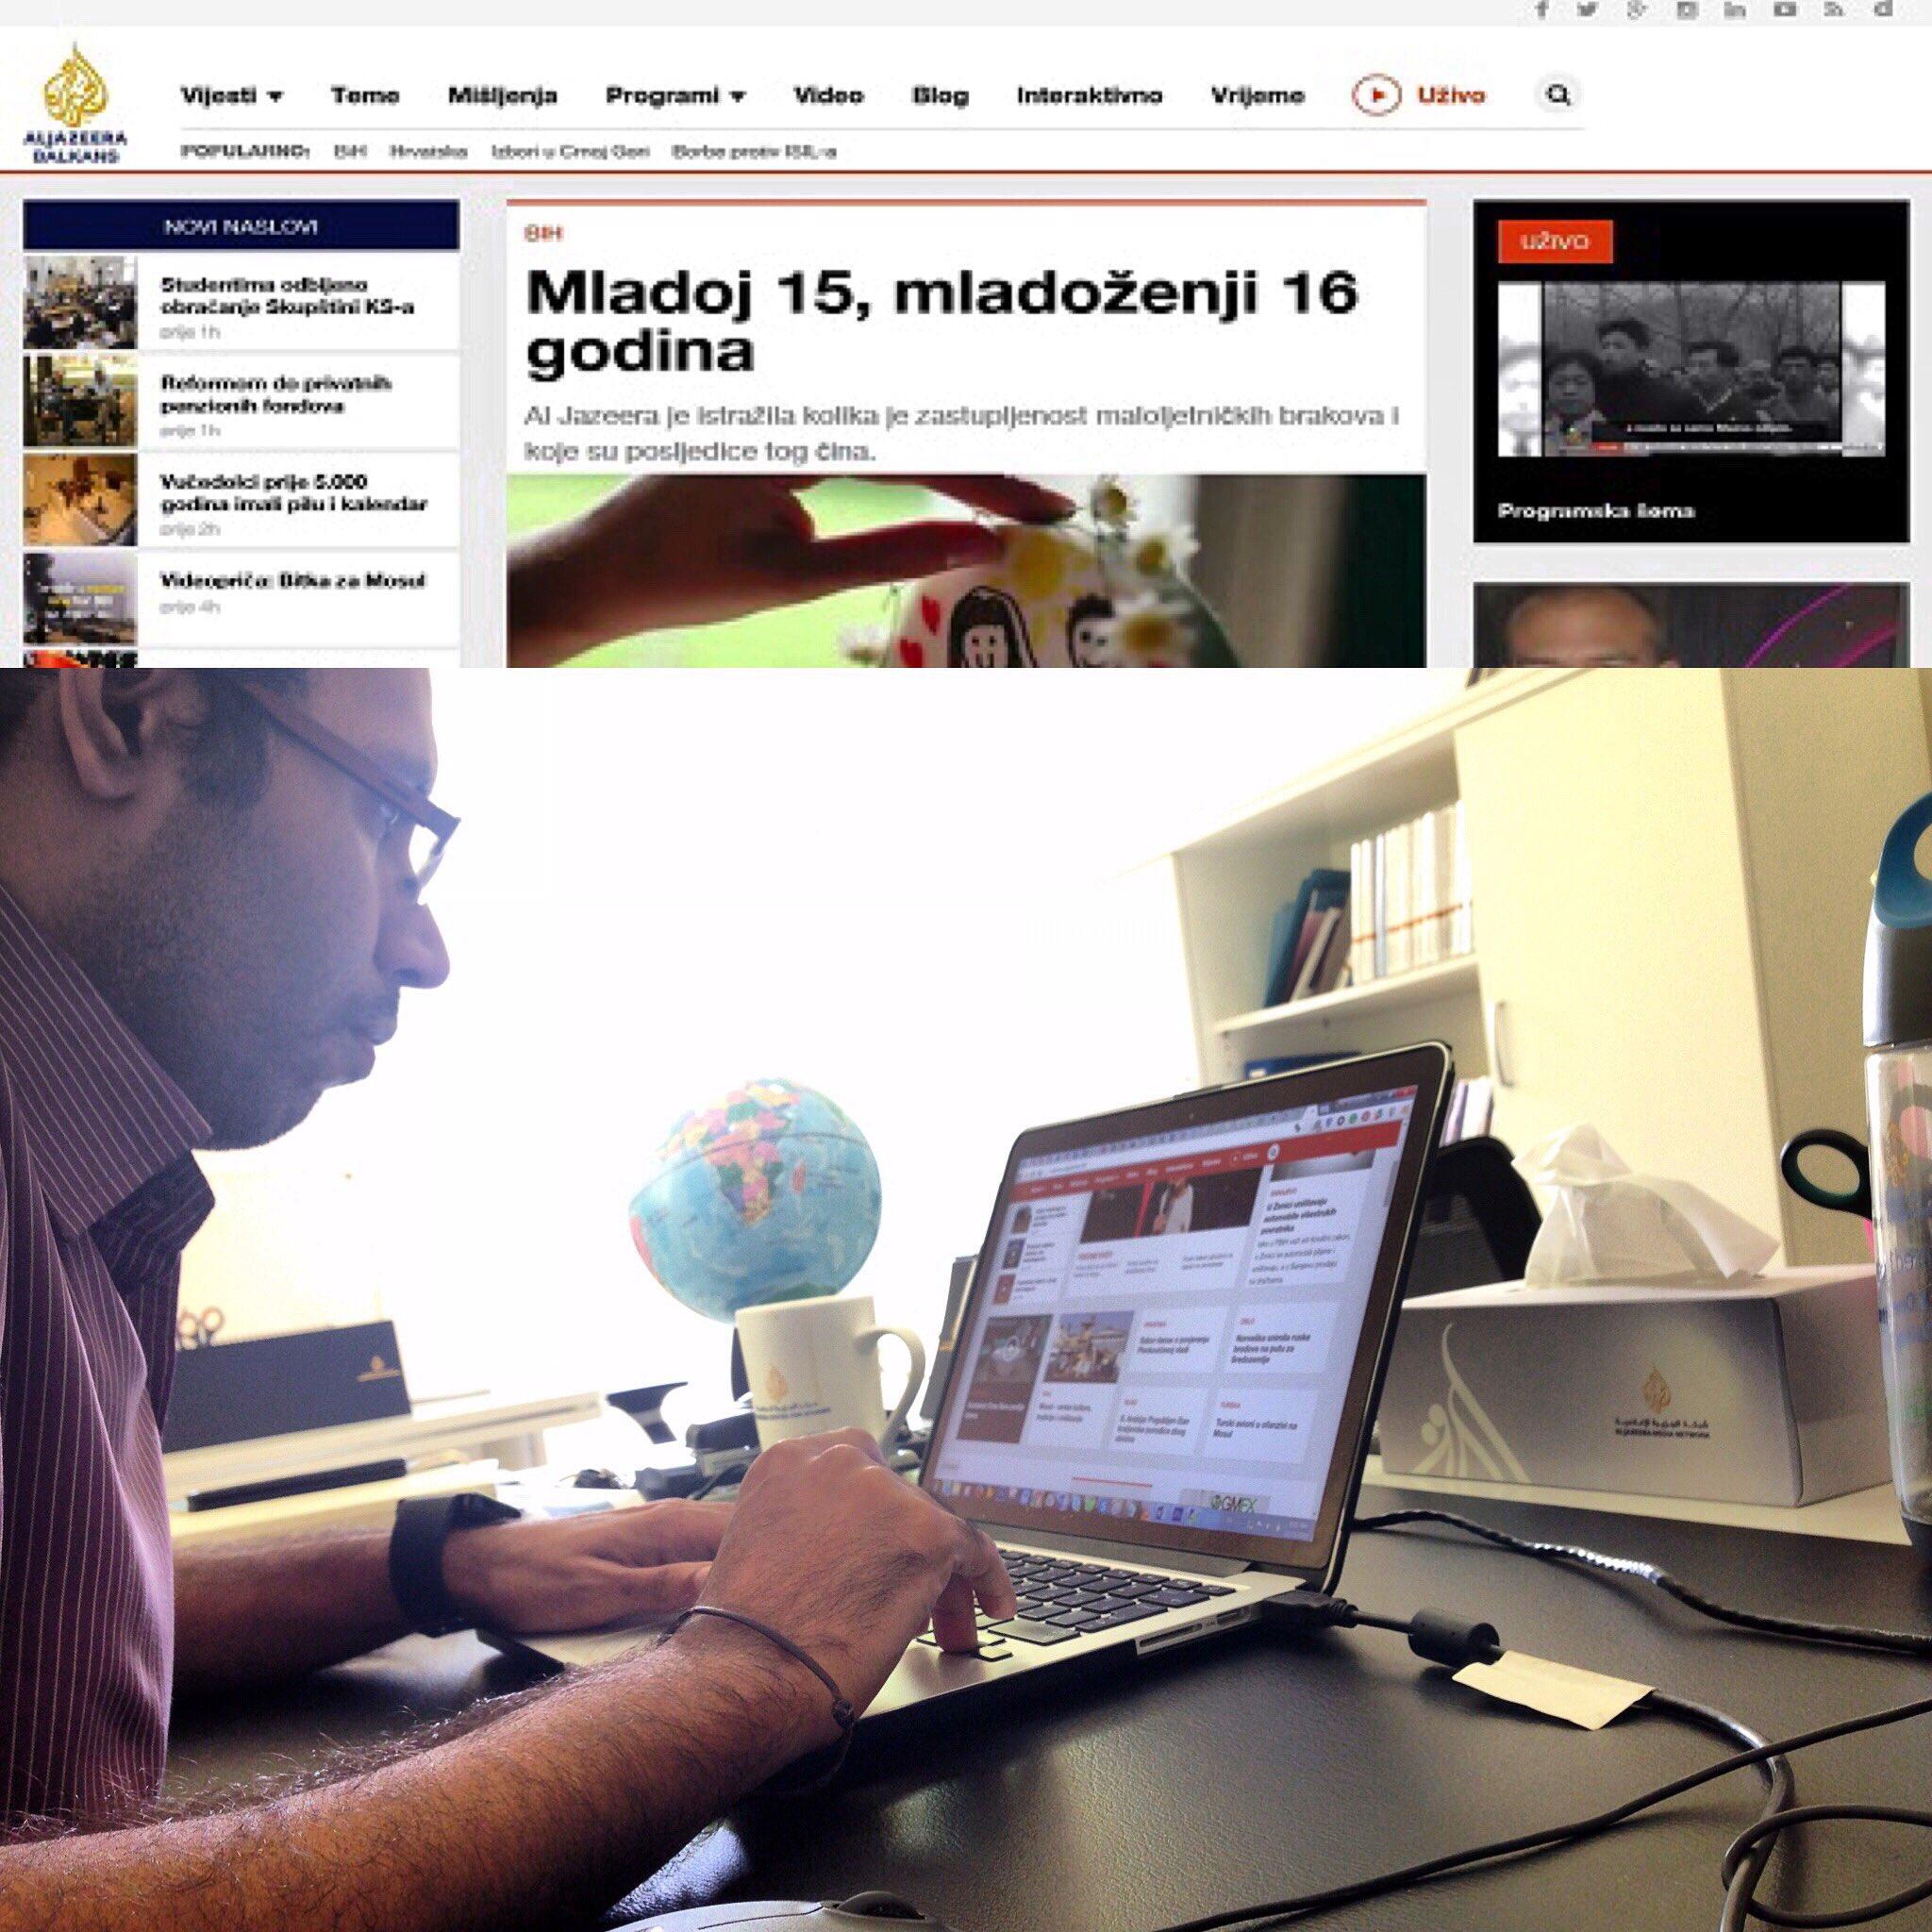 mohamed mahdy on twitter aljazeera balkans ajb launched its